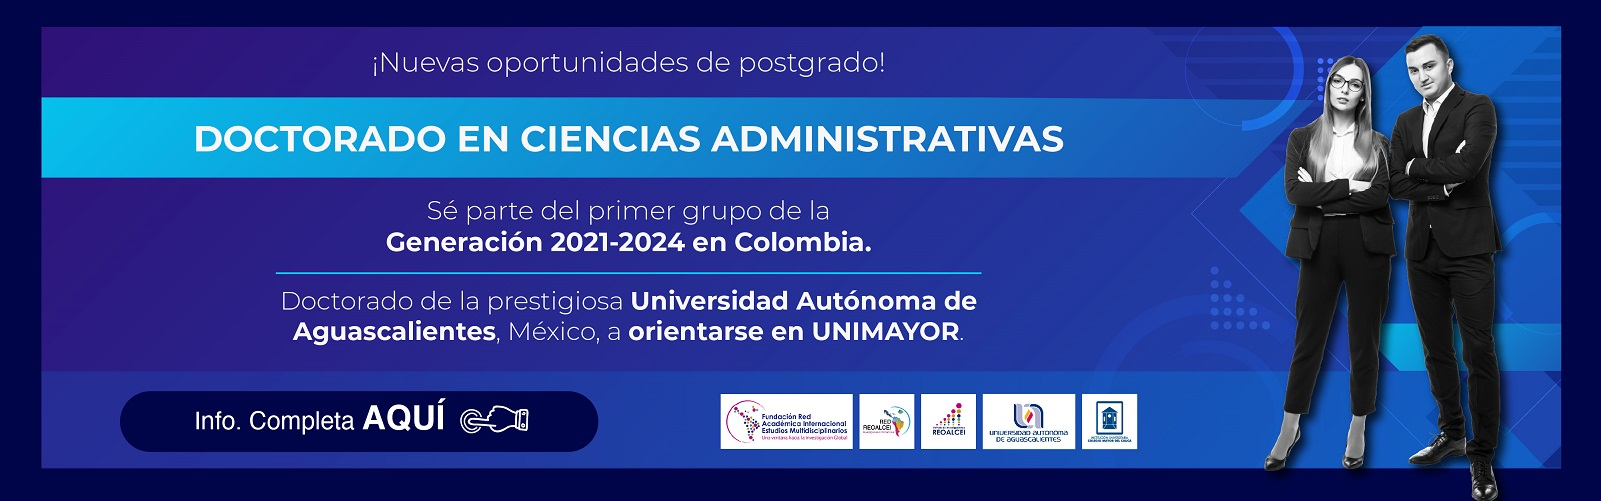 Banner_Doctorado